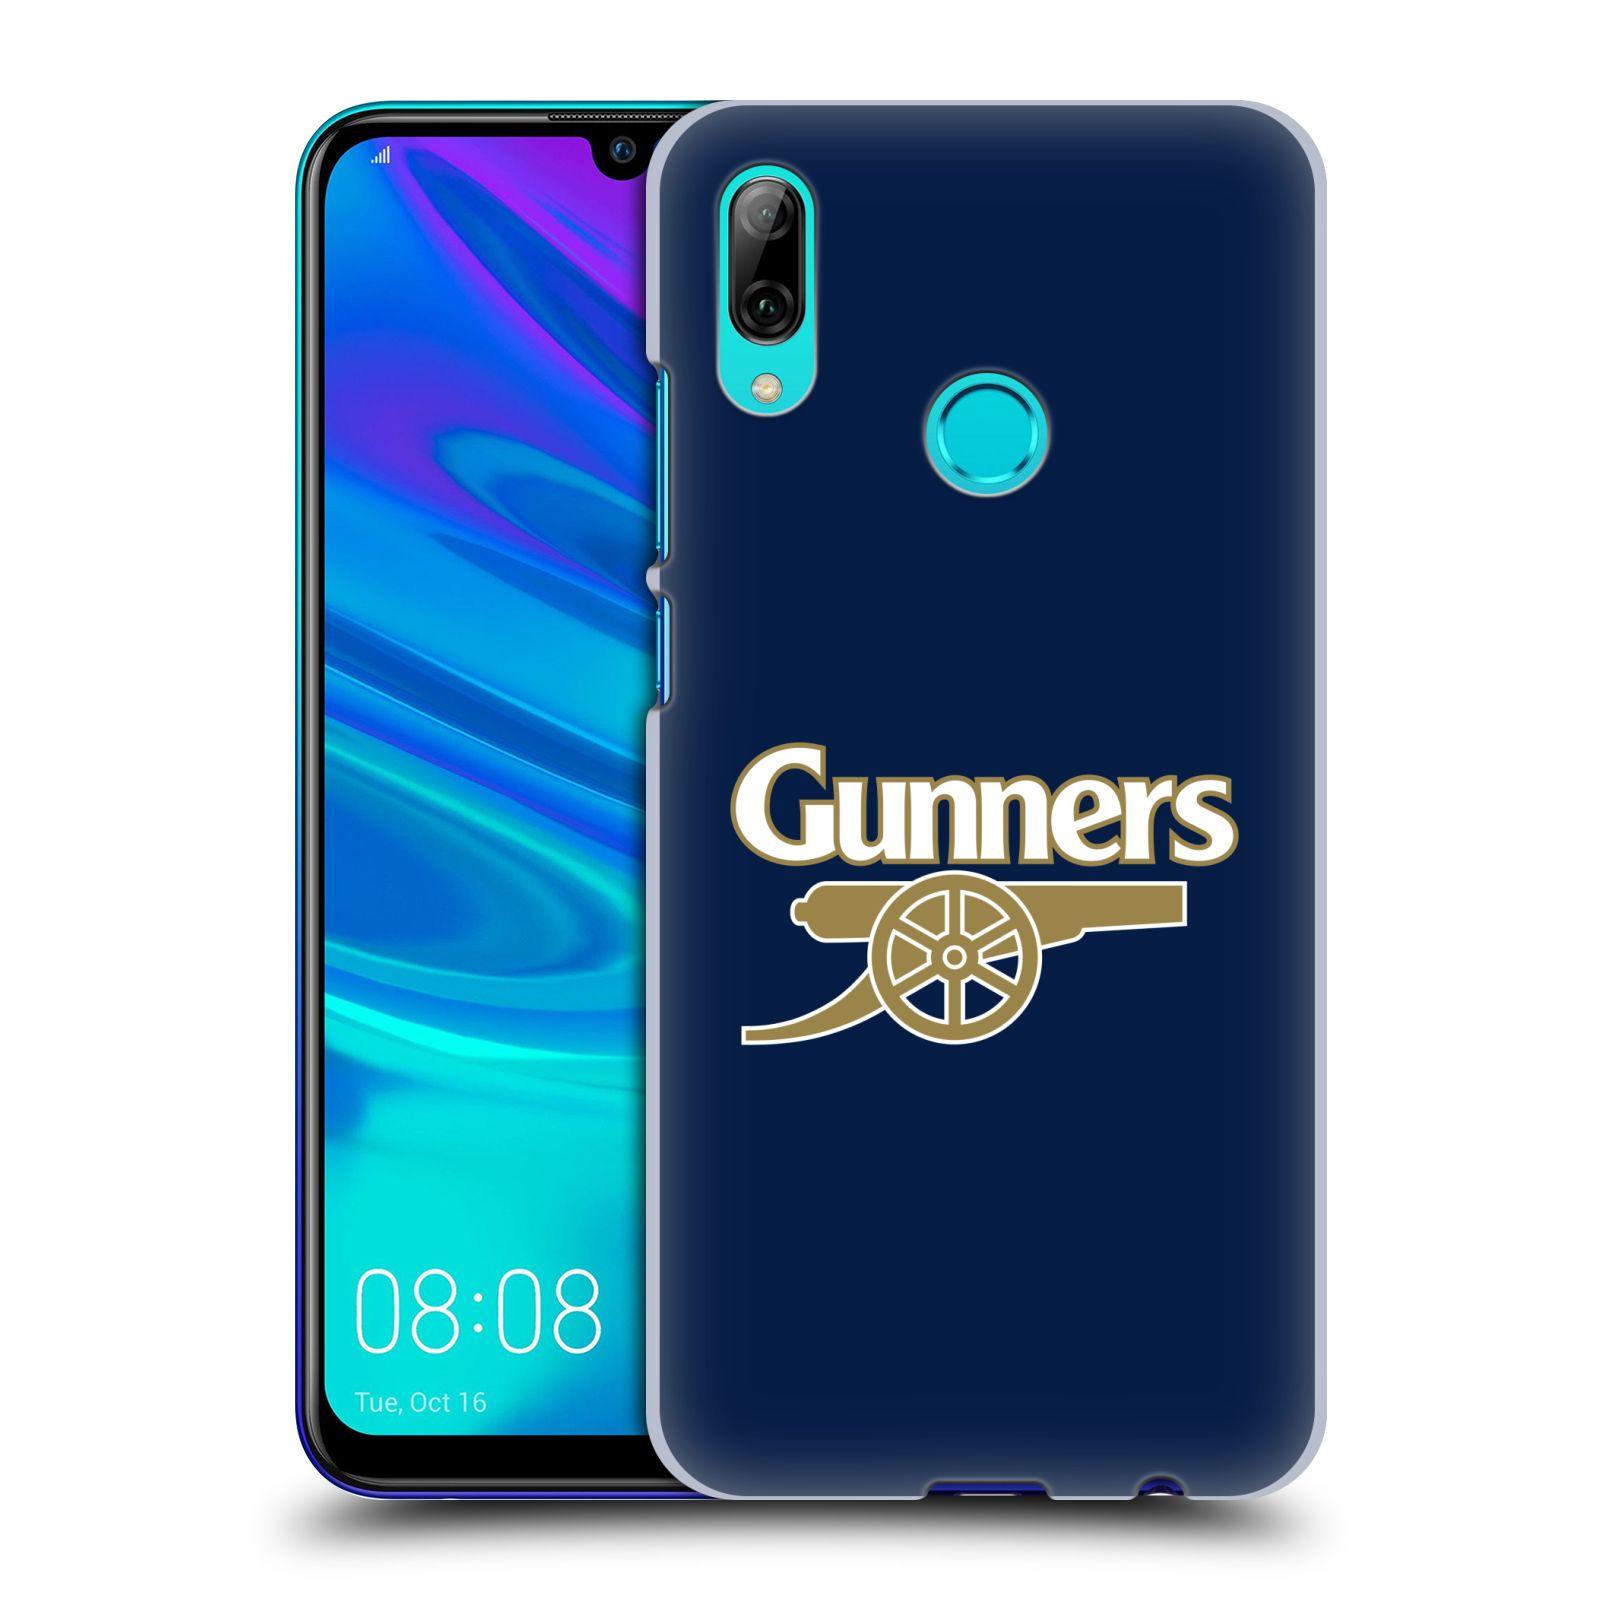 Plastové pouzdro na mobil Honor 10 Lite - Head Case - Arsenal FC - Gunners